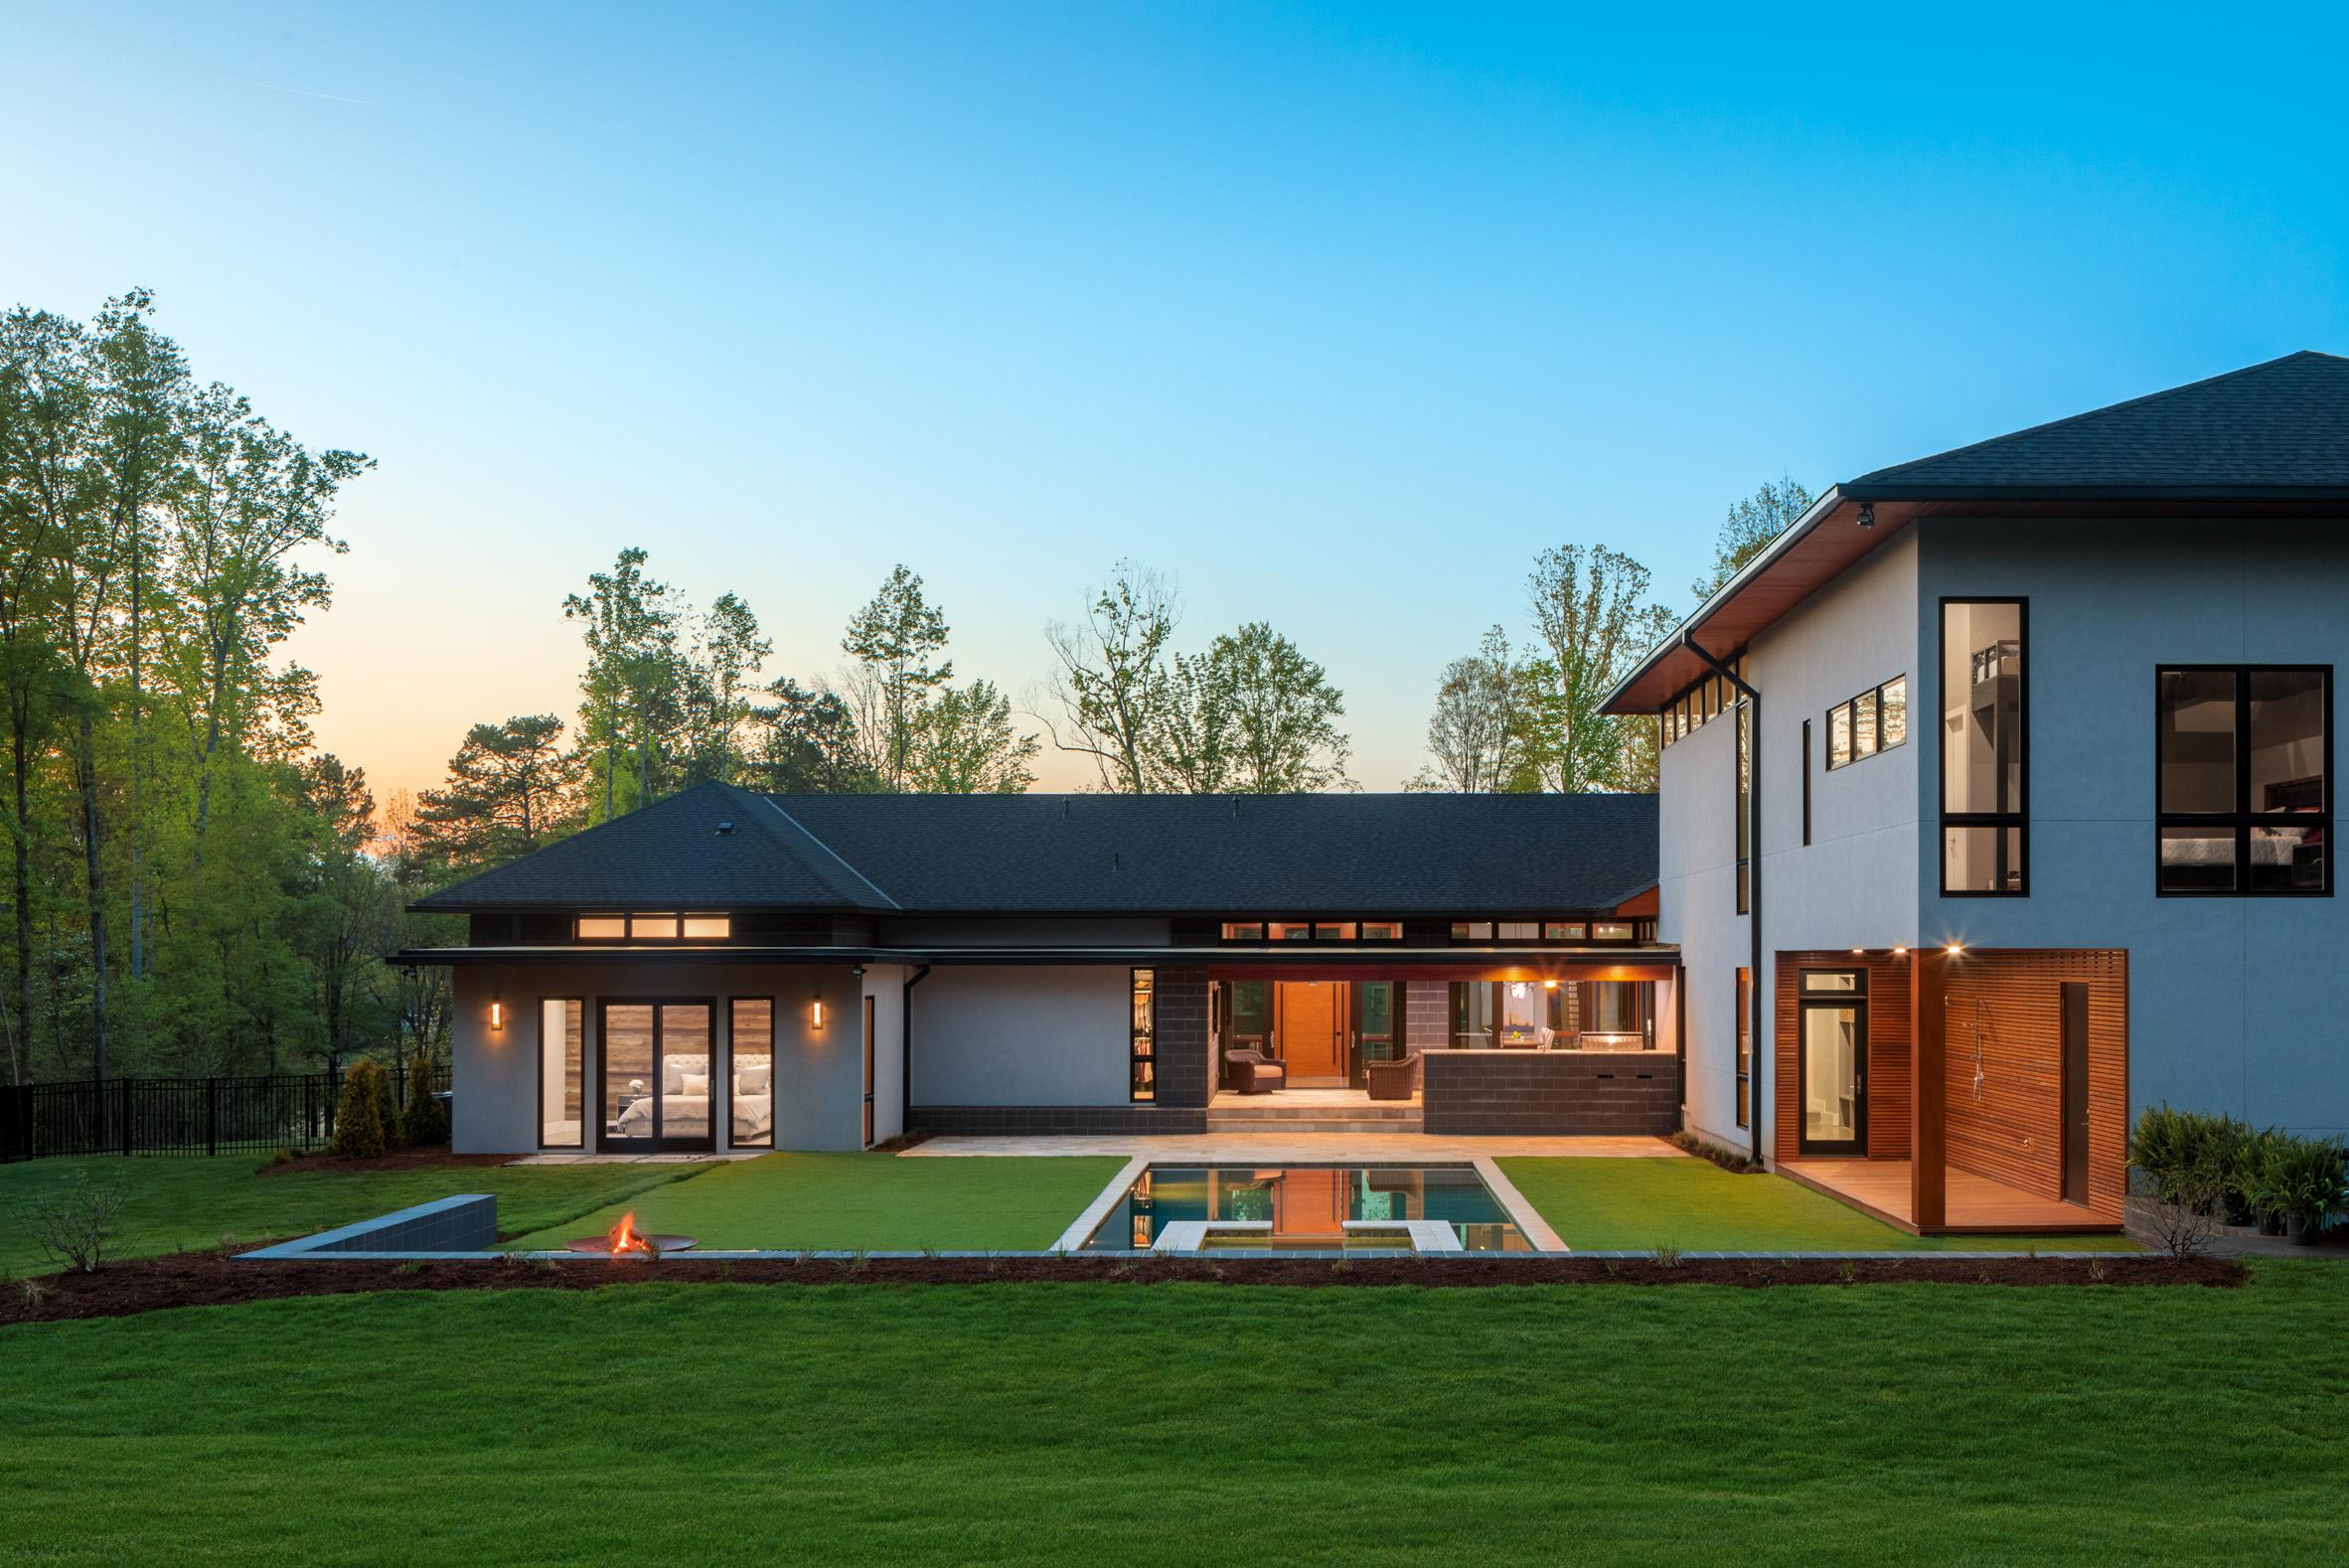 Grey brick, stucco and warm timber wrap South Carolina home by Marica McKeel